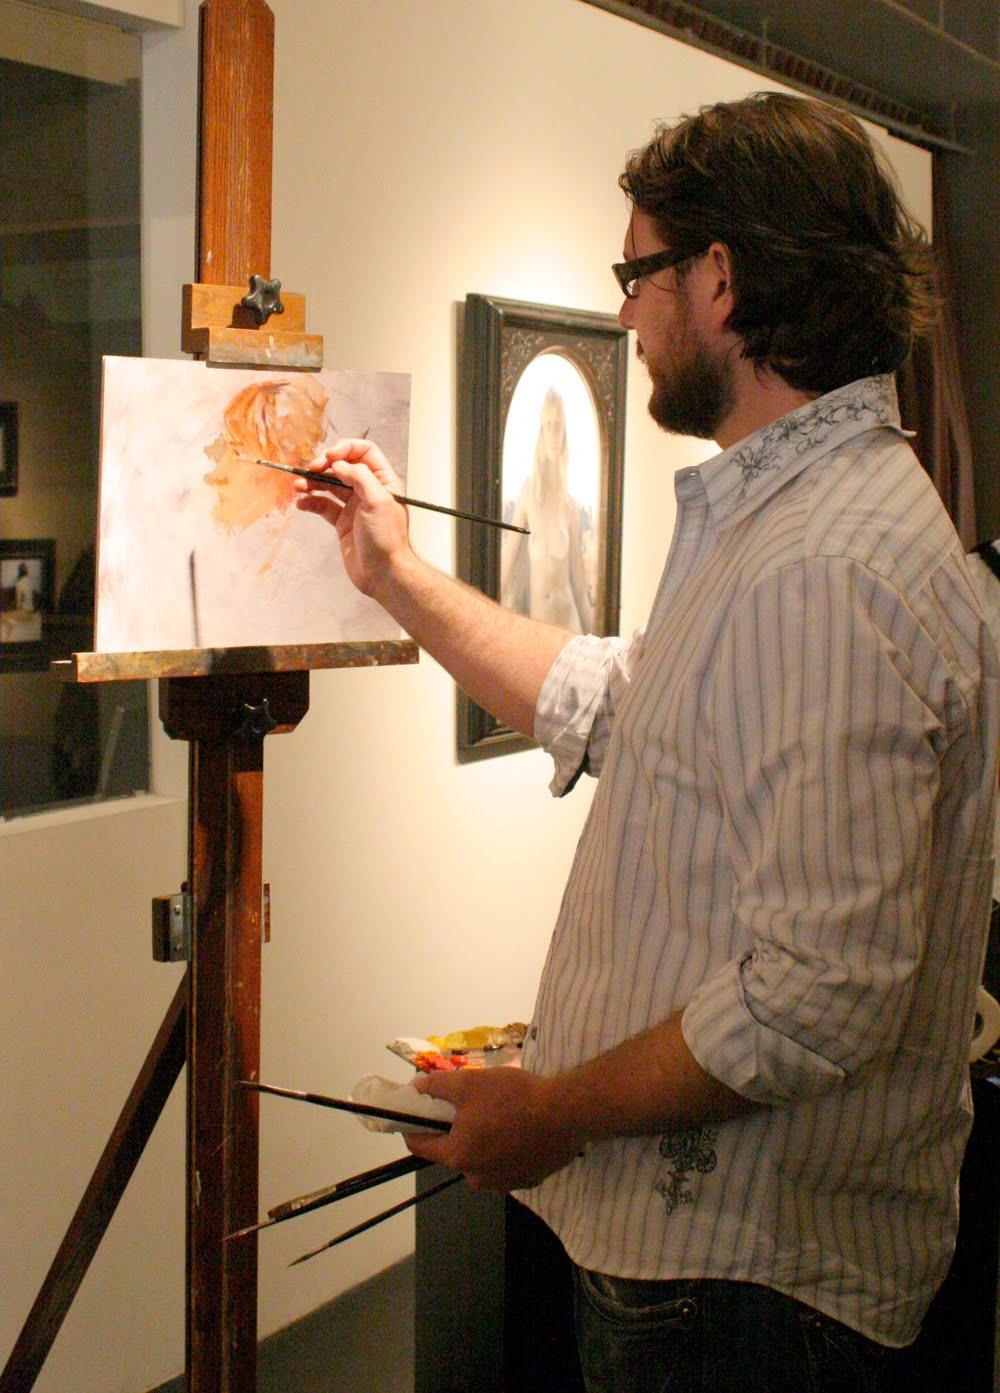 D Painting Exhibition : Ryan mellody art jeremy lipking demo